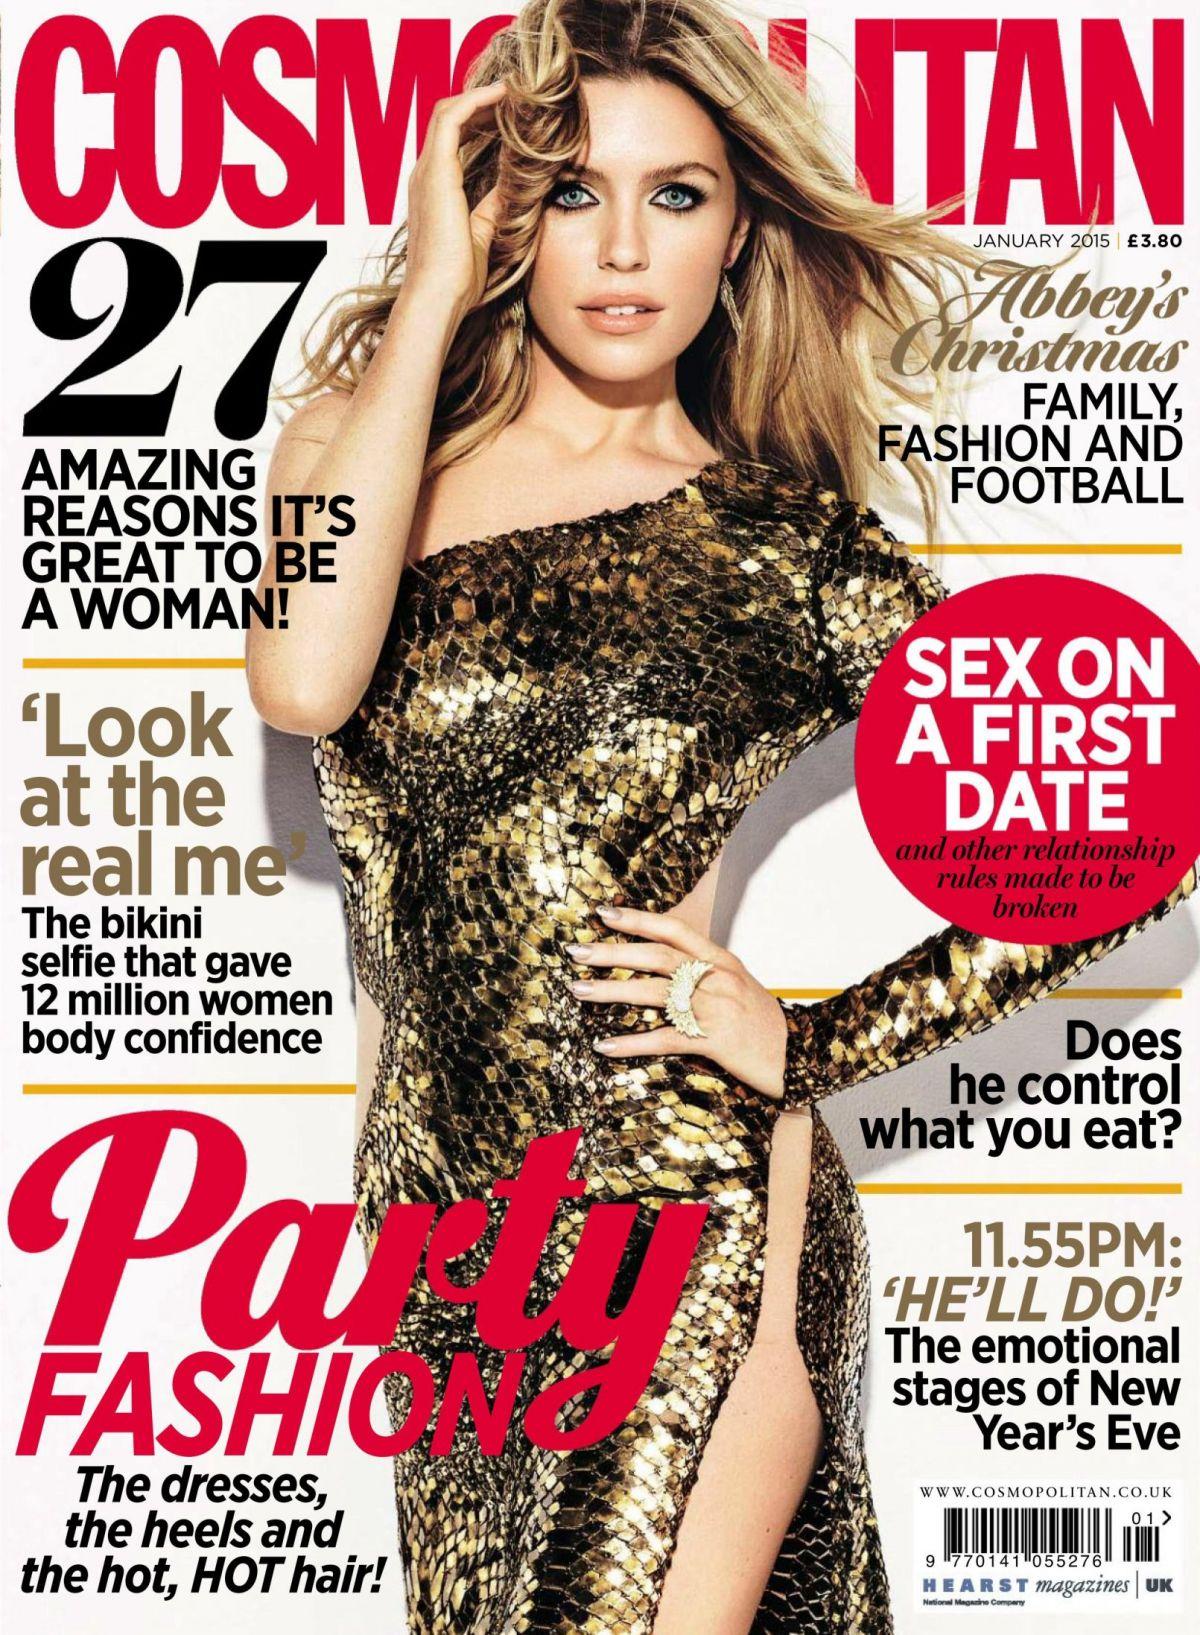 ABIGAIL ABBEY CLANCY in Cosmopolitan Magazine, January 2015 Issue